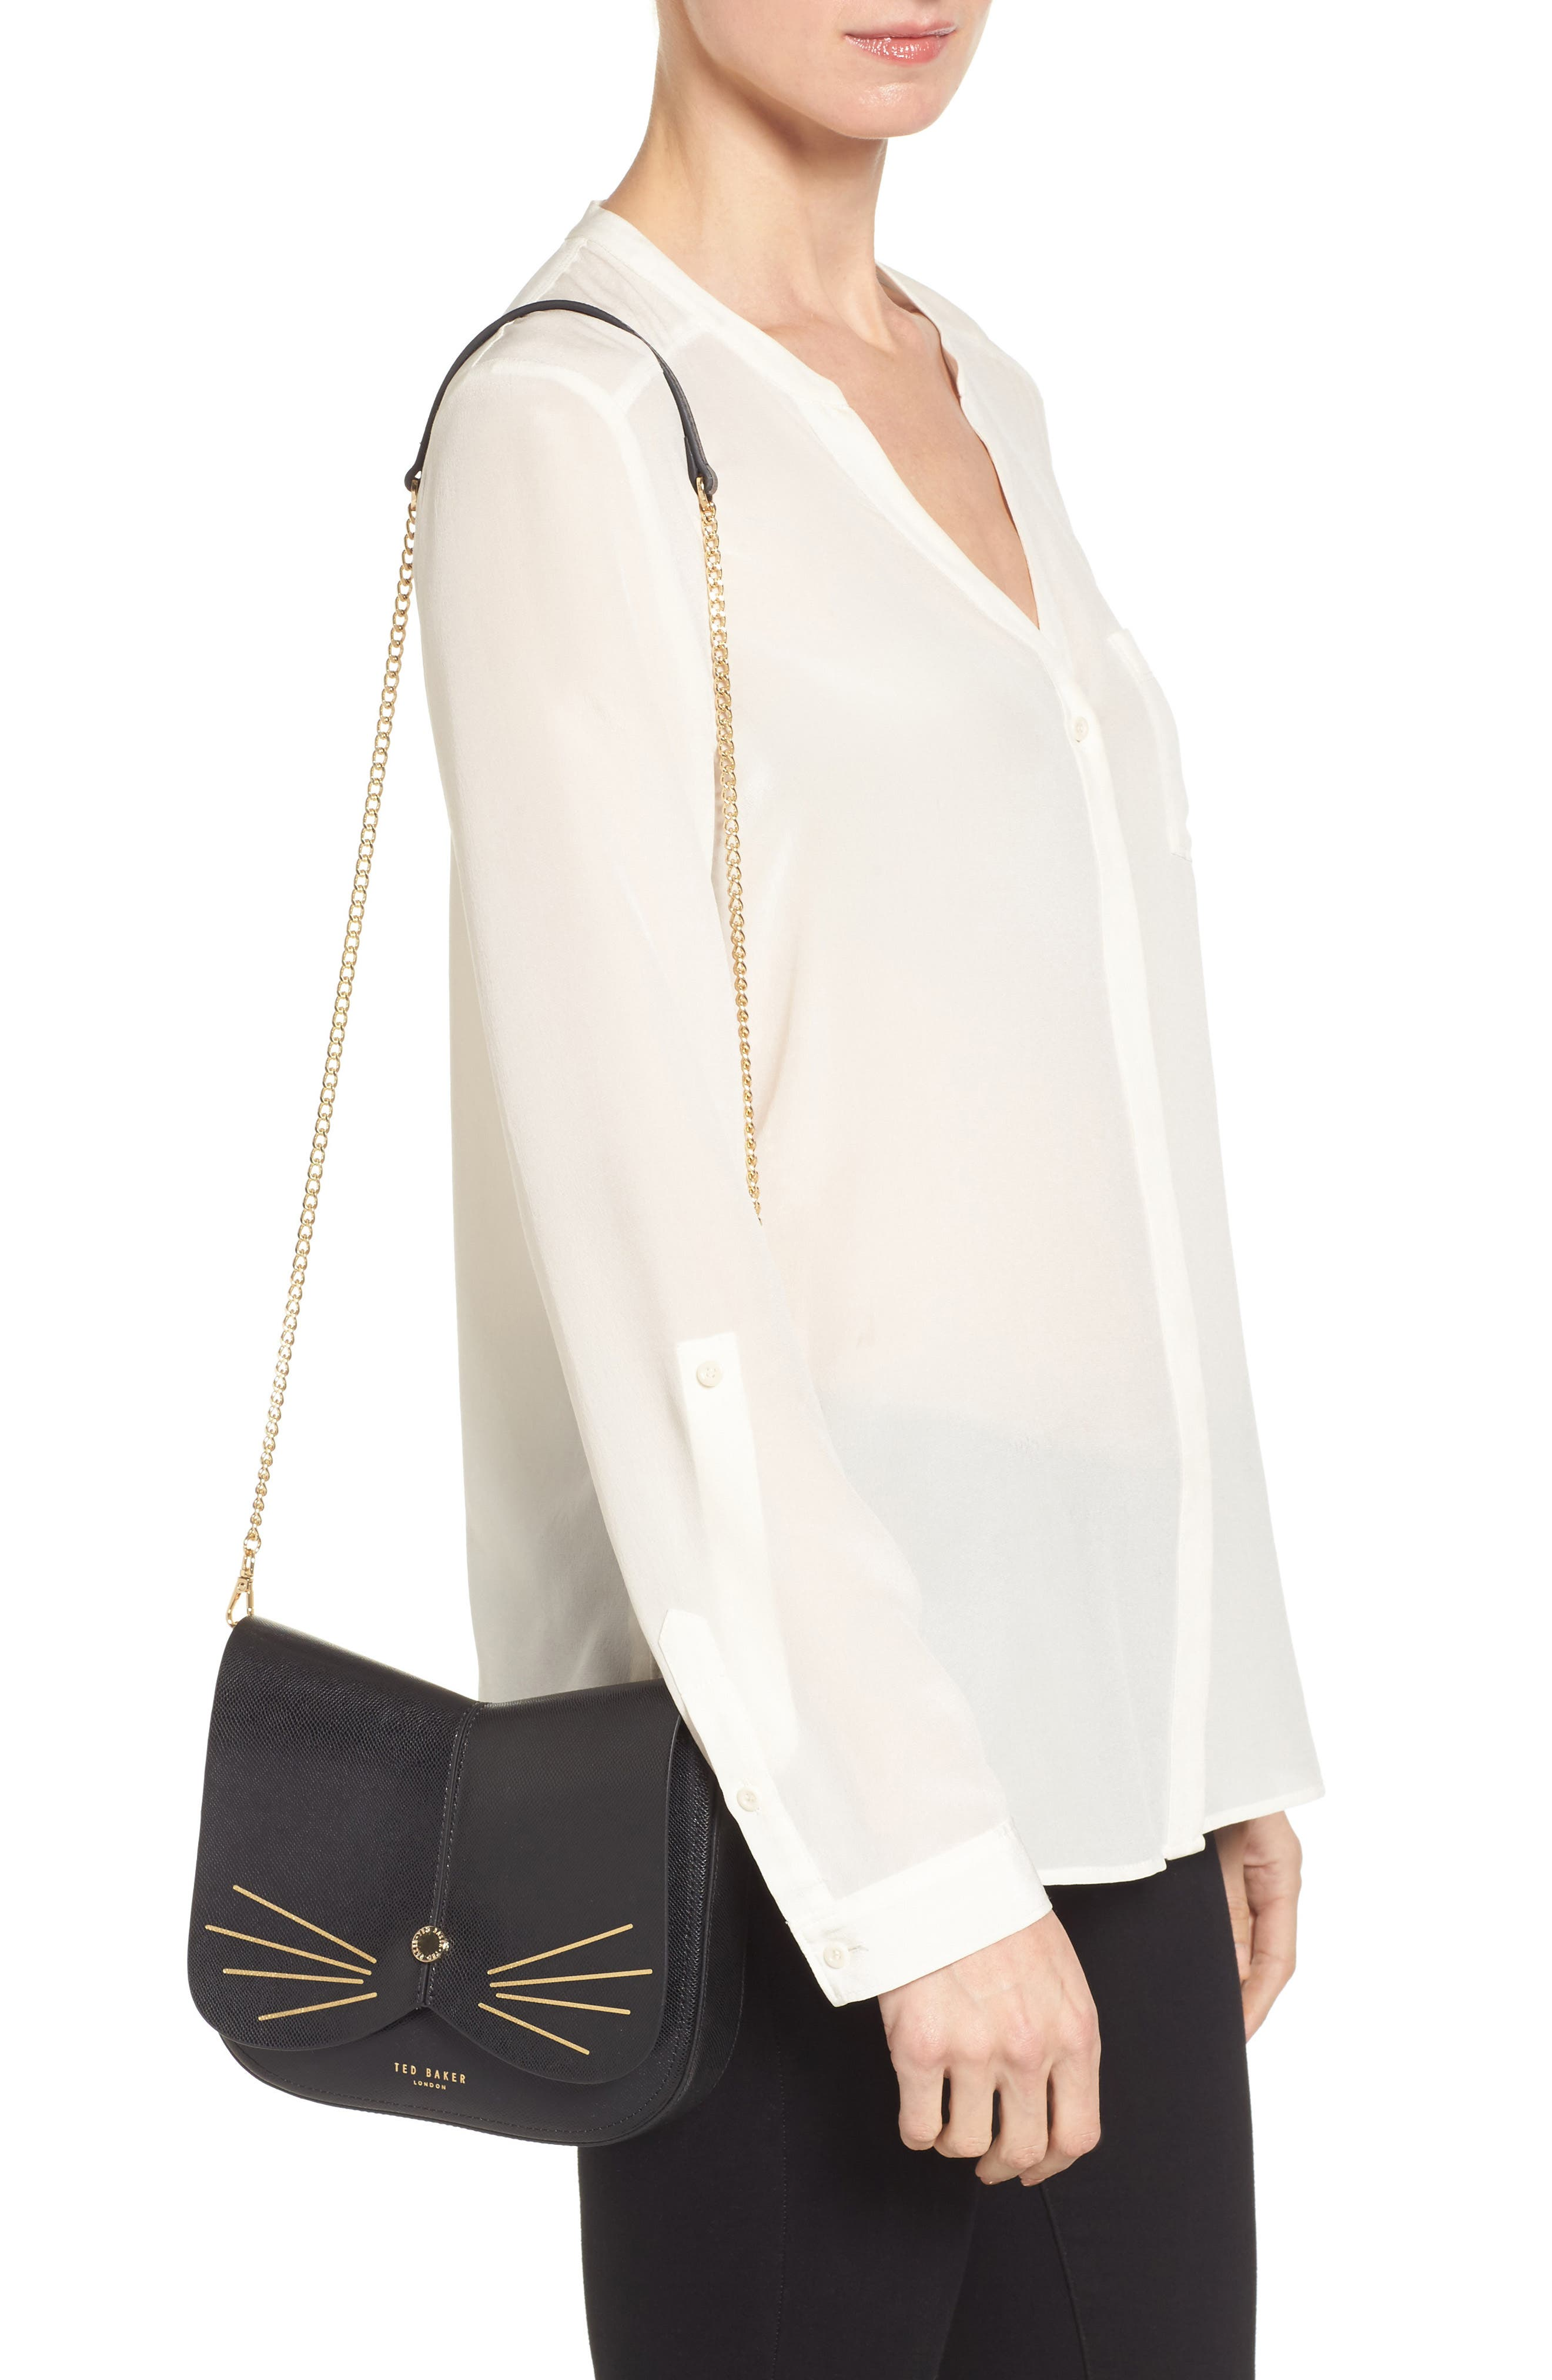 Kittii Cat Leather Crossbody Bag,                             Alternate thumbnail 2, color,                             001